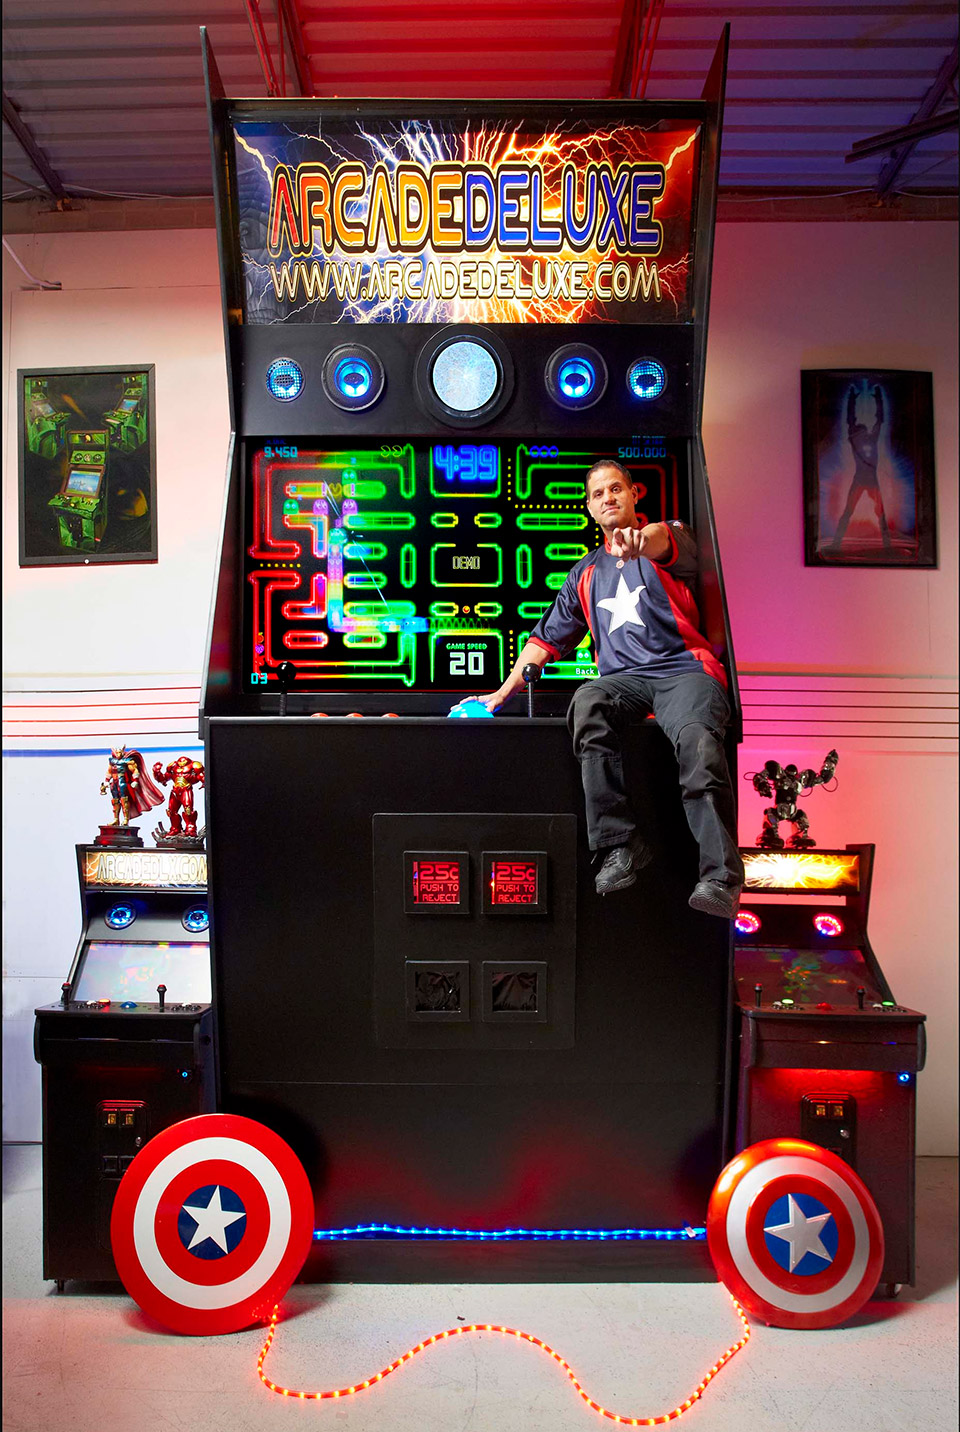 The World's Largest Arcade Machine